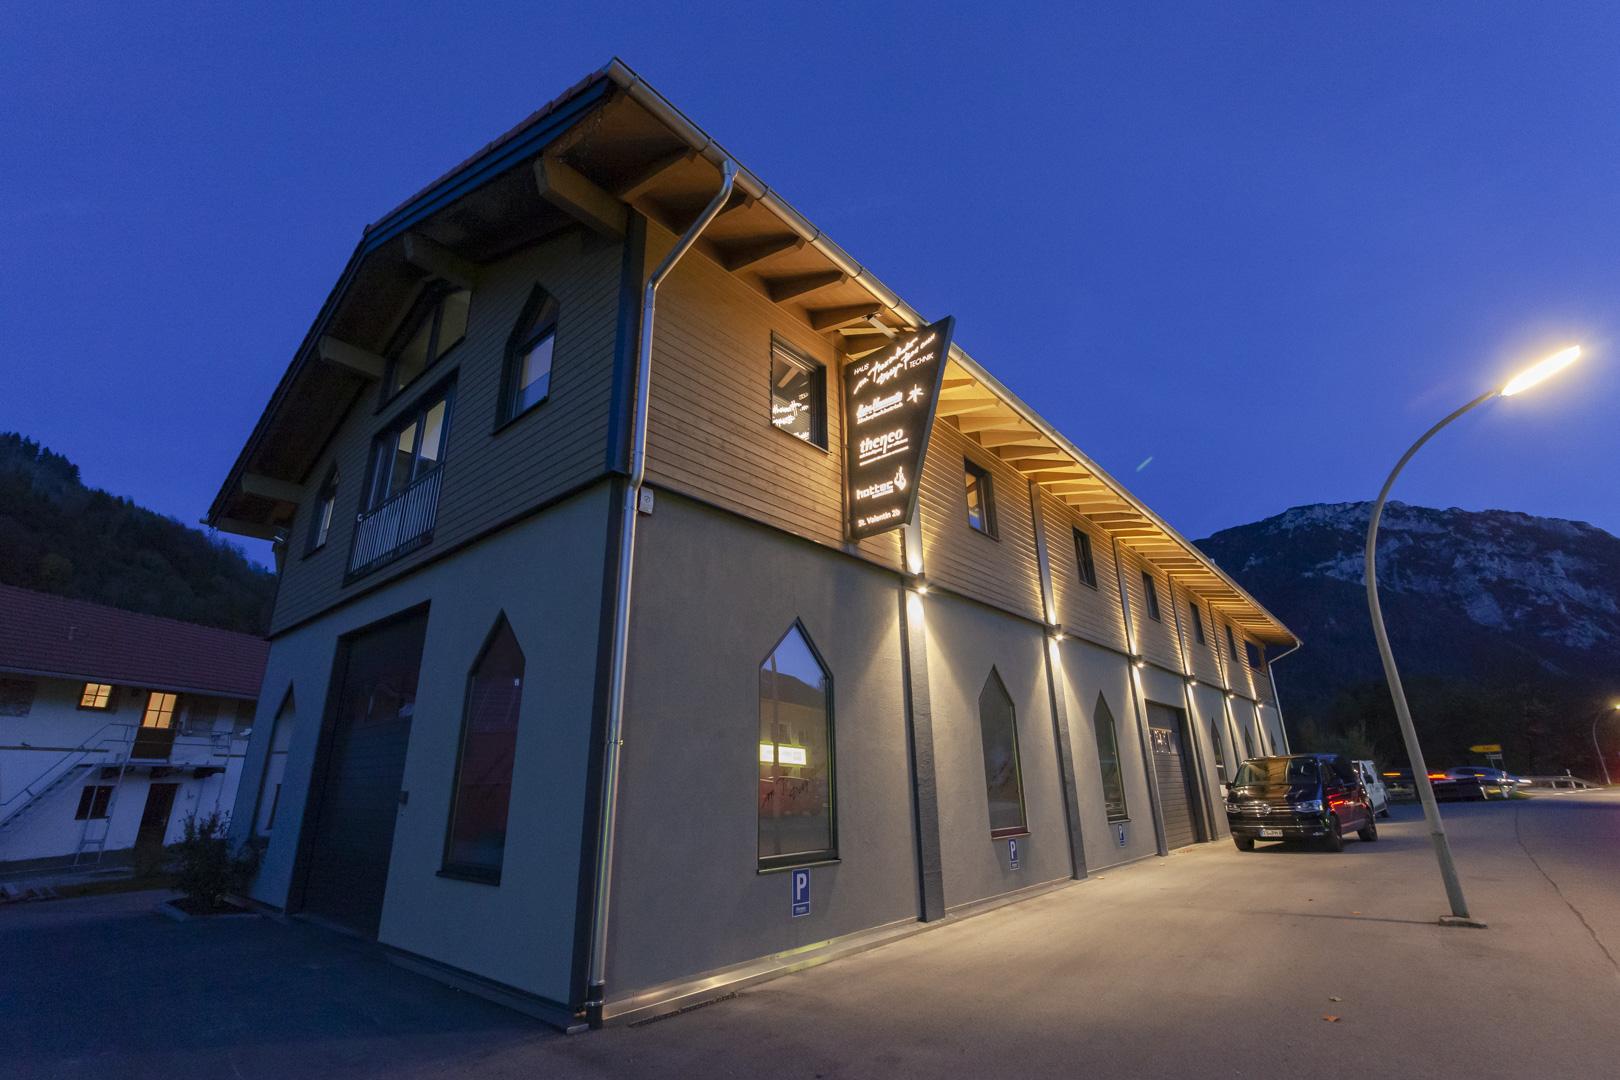 Galerie Gewerbebauten - Praxenthaler Ruhpolding 1